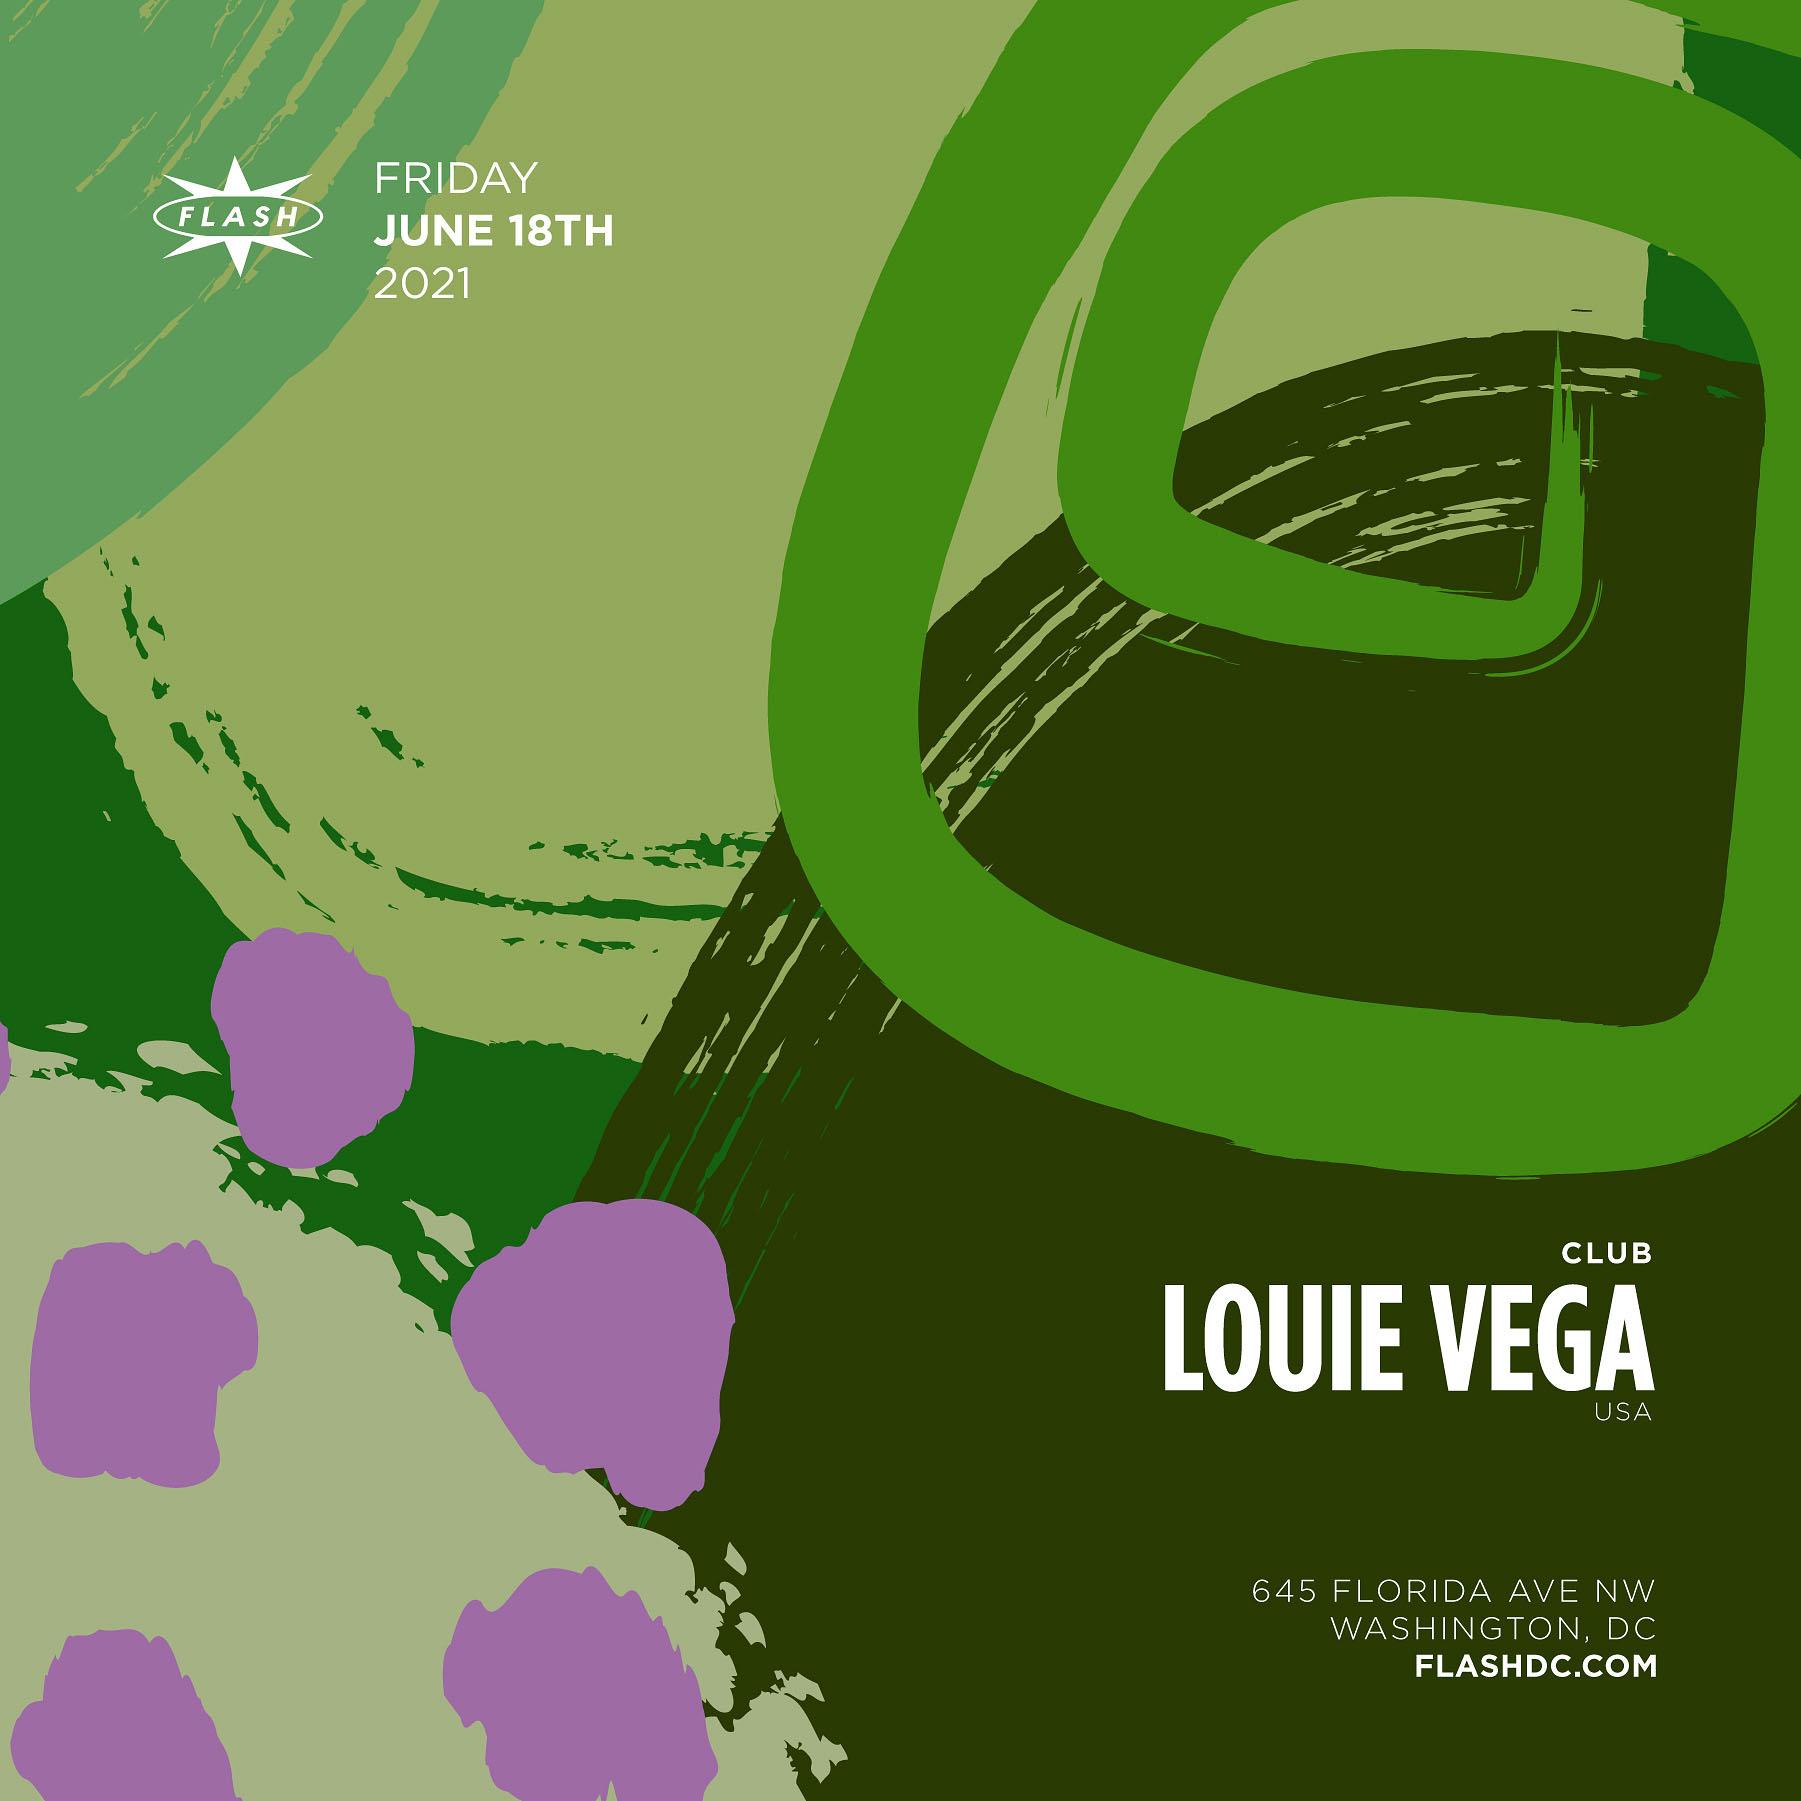 Little Louie Vega event thumbnail